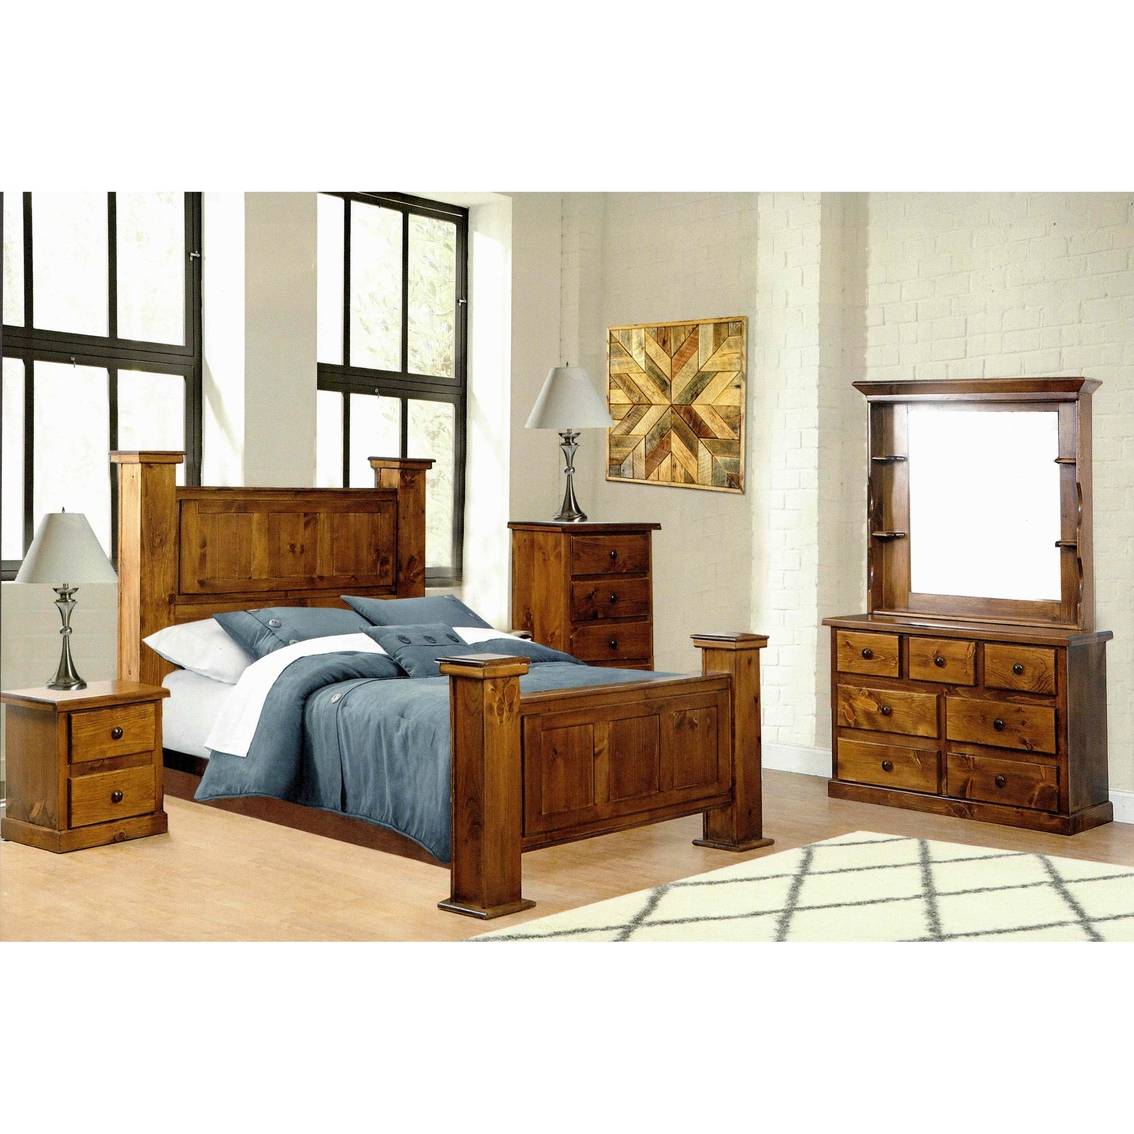 Chelsea Home Furniture Hide Away Gun Bed 5 Pc Set Bedroom Sets